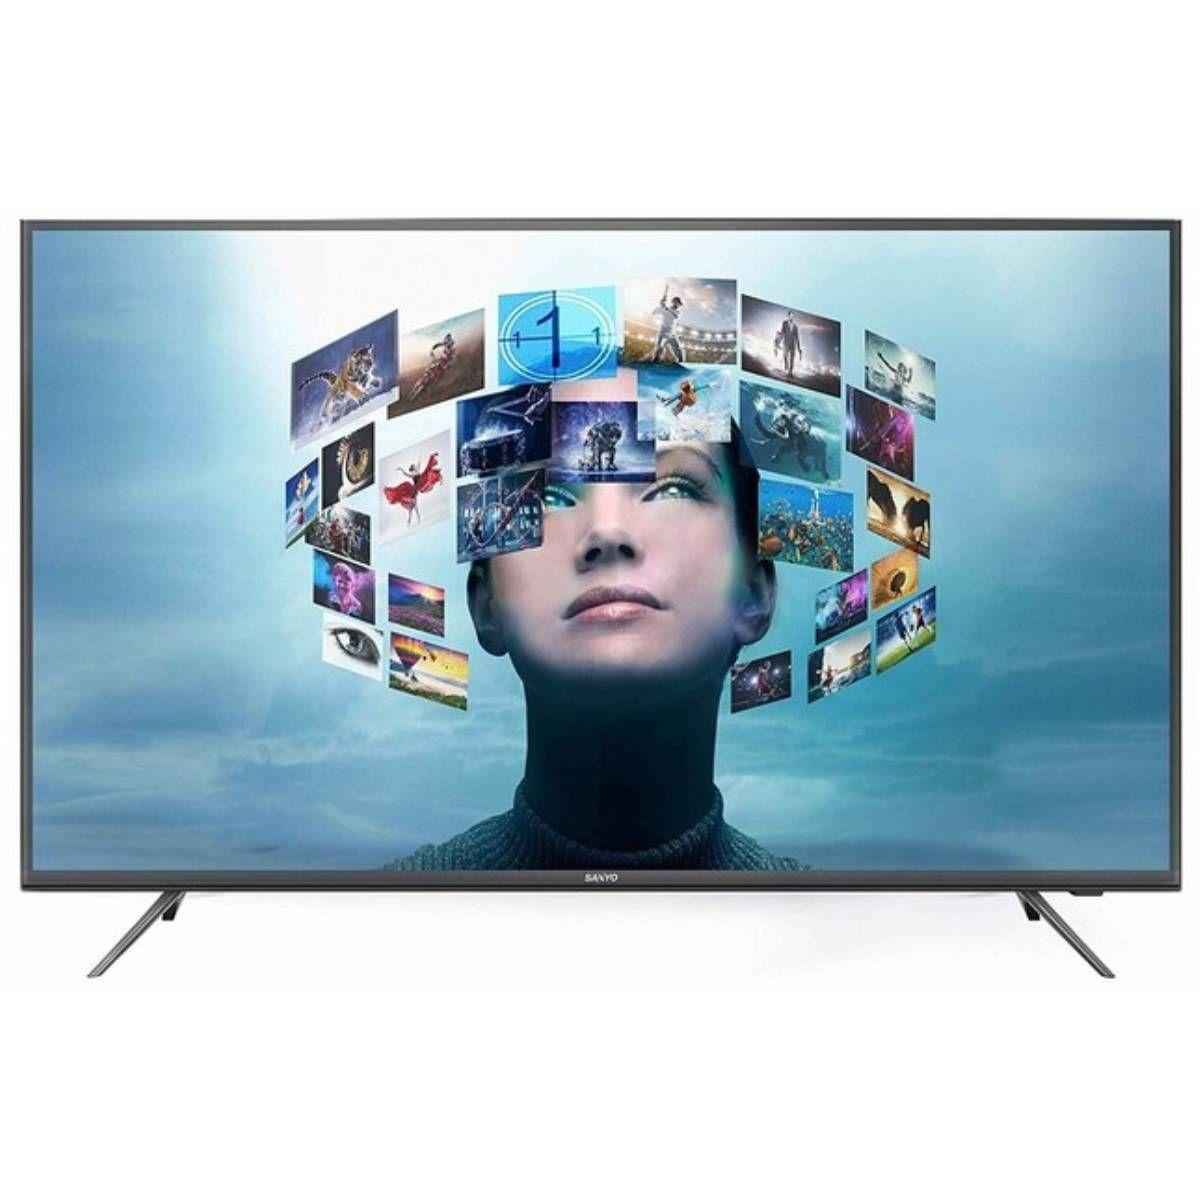 Sanyo 49 इंच 4K LED Ultra HD टीवी (XT-49A081U)